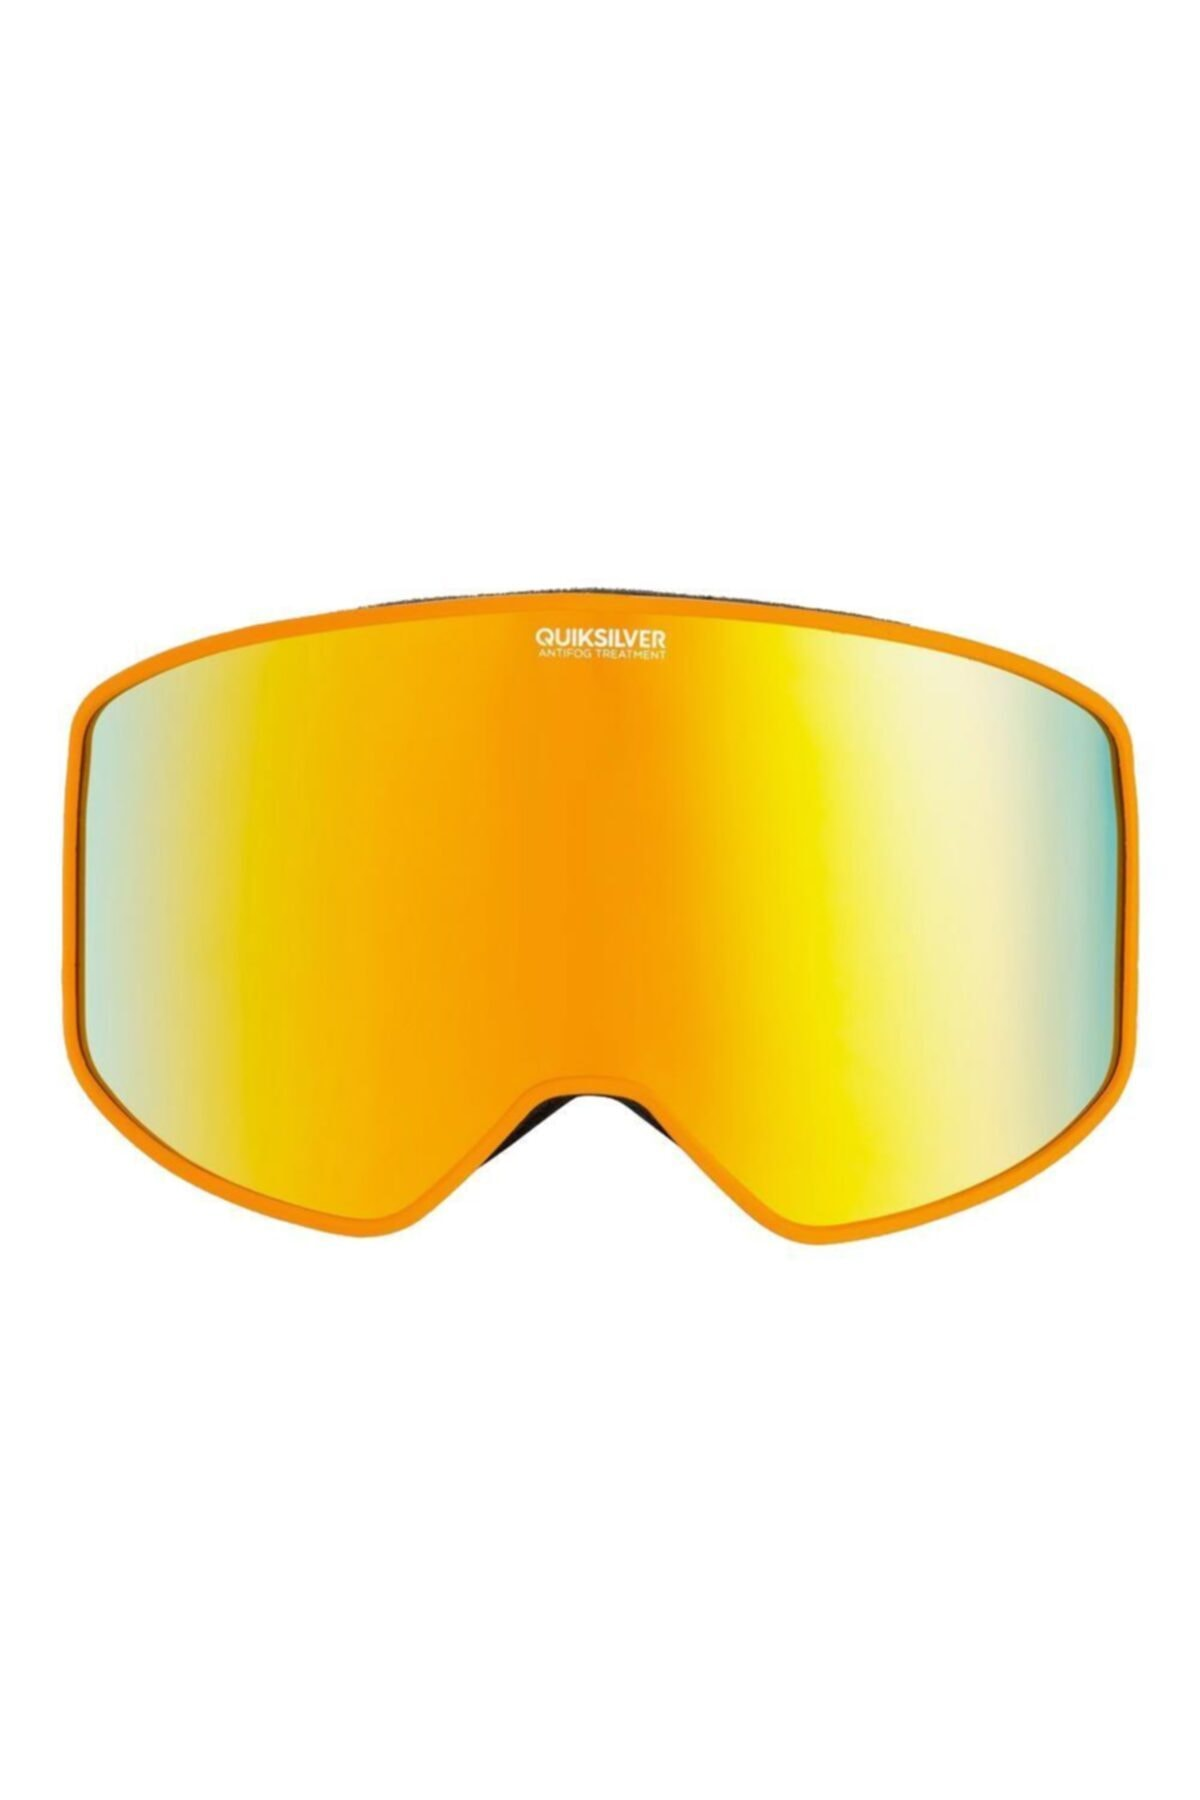 Quiksilver Storm Erkek Snowboard Gözlüğü Eqytg03099nkp0 2